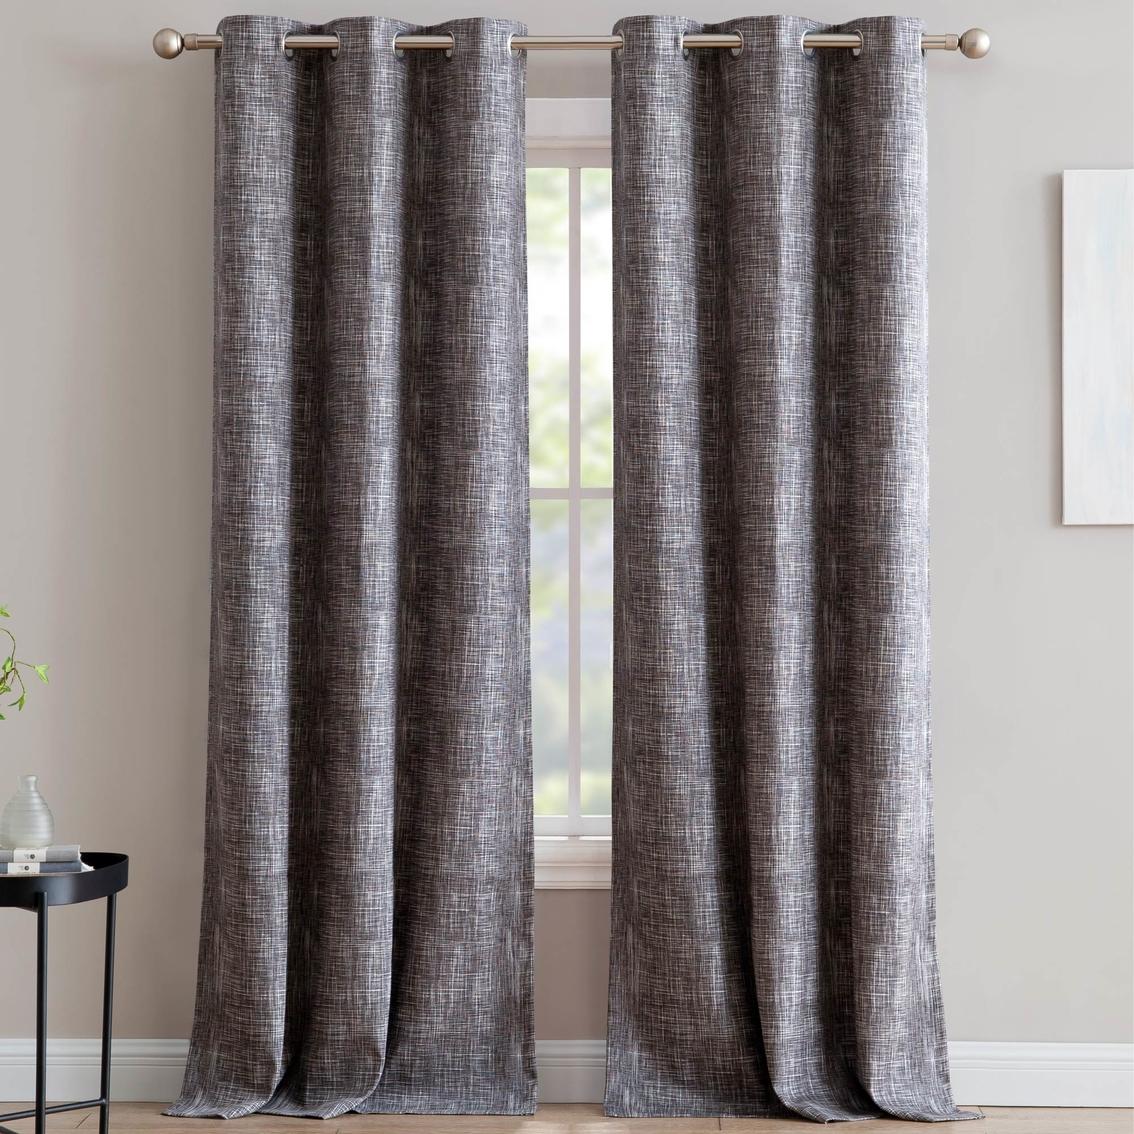 1888 Mills Linen Textured Print Single Blackout Curtain